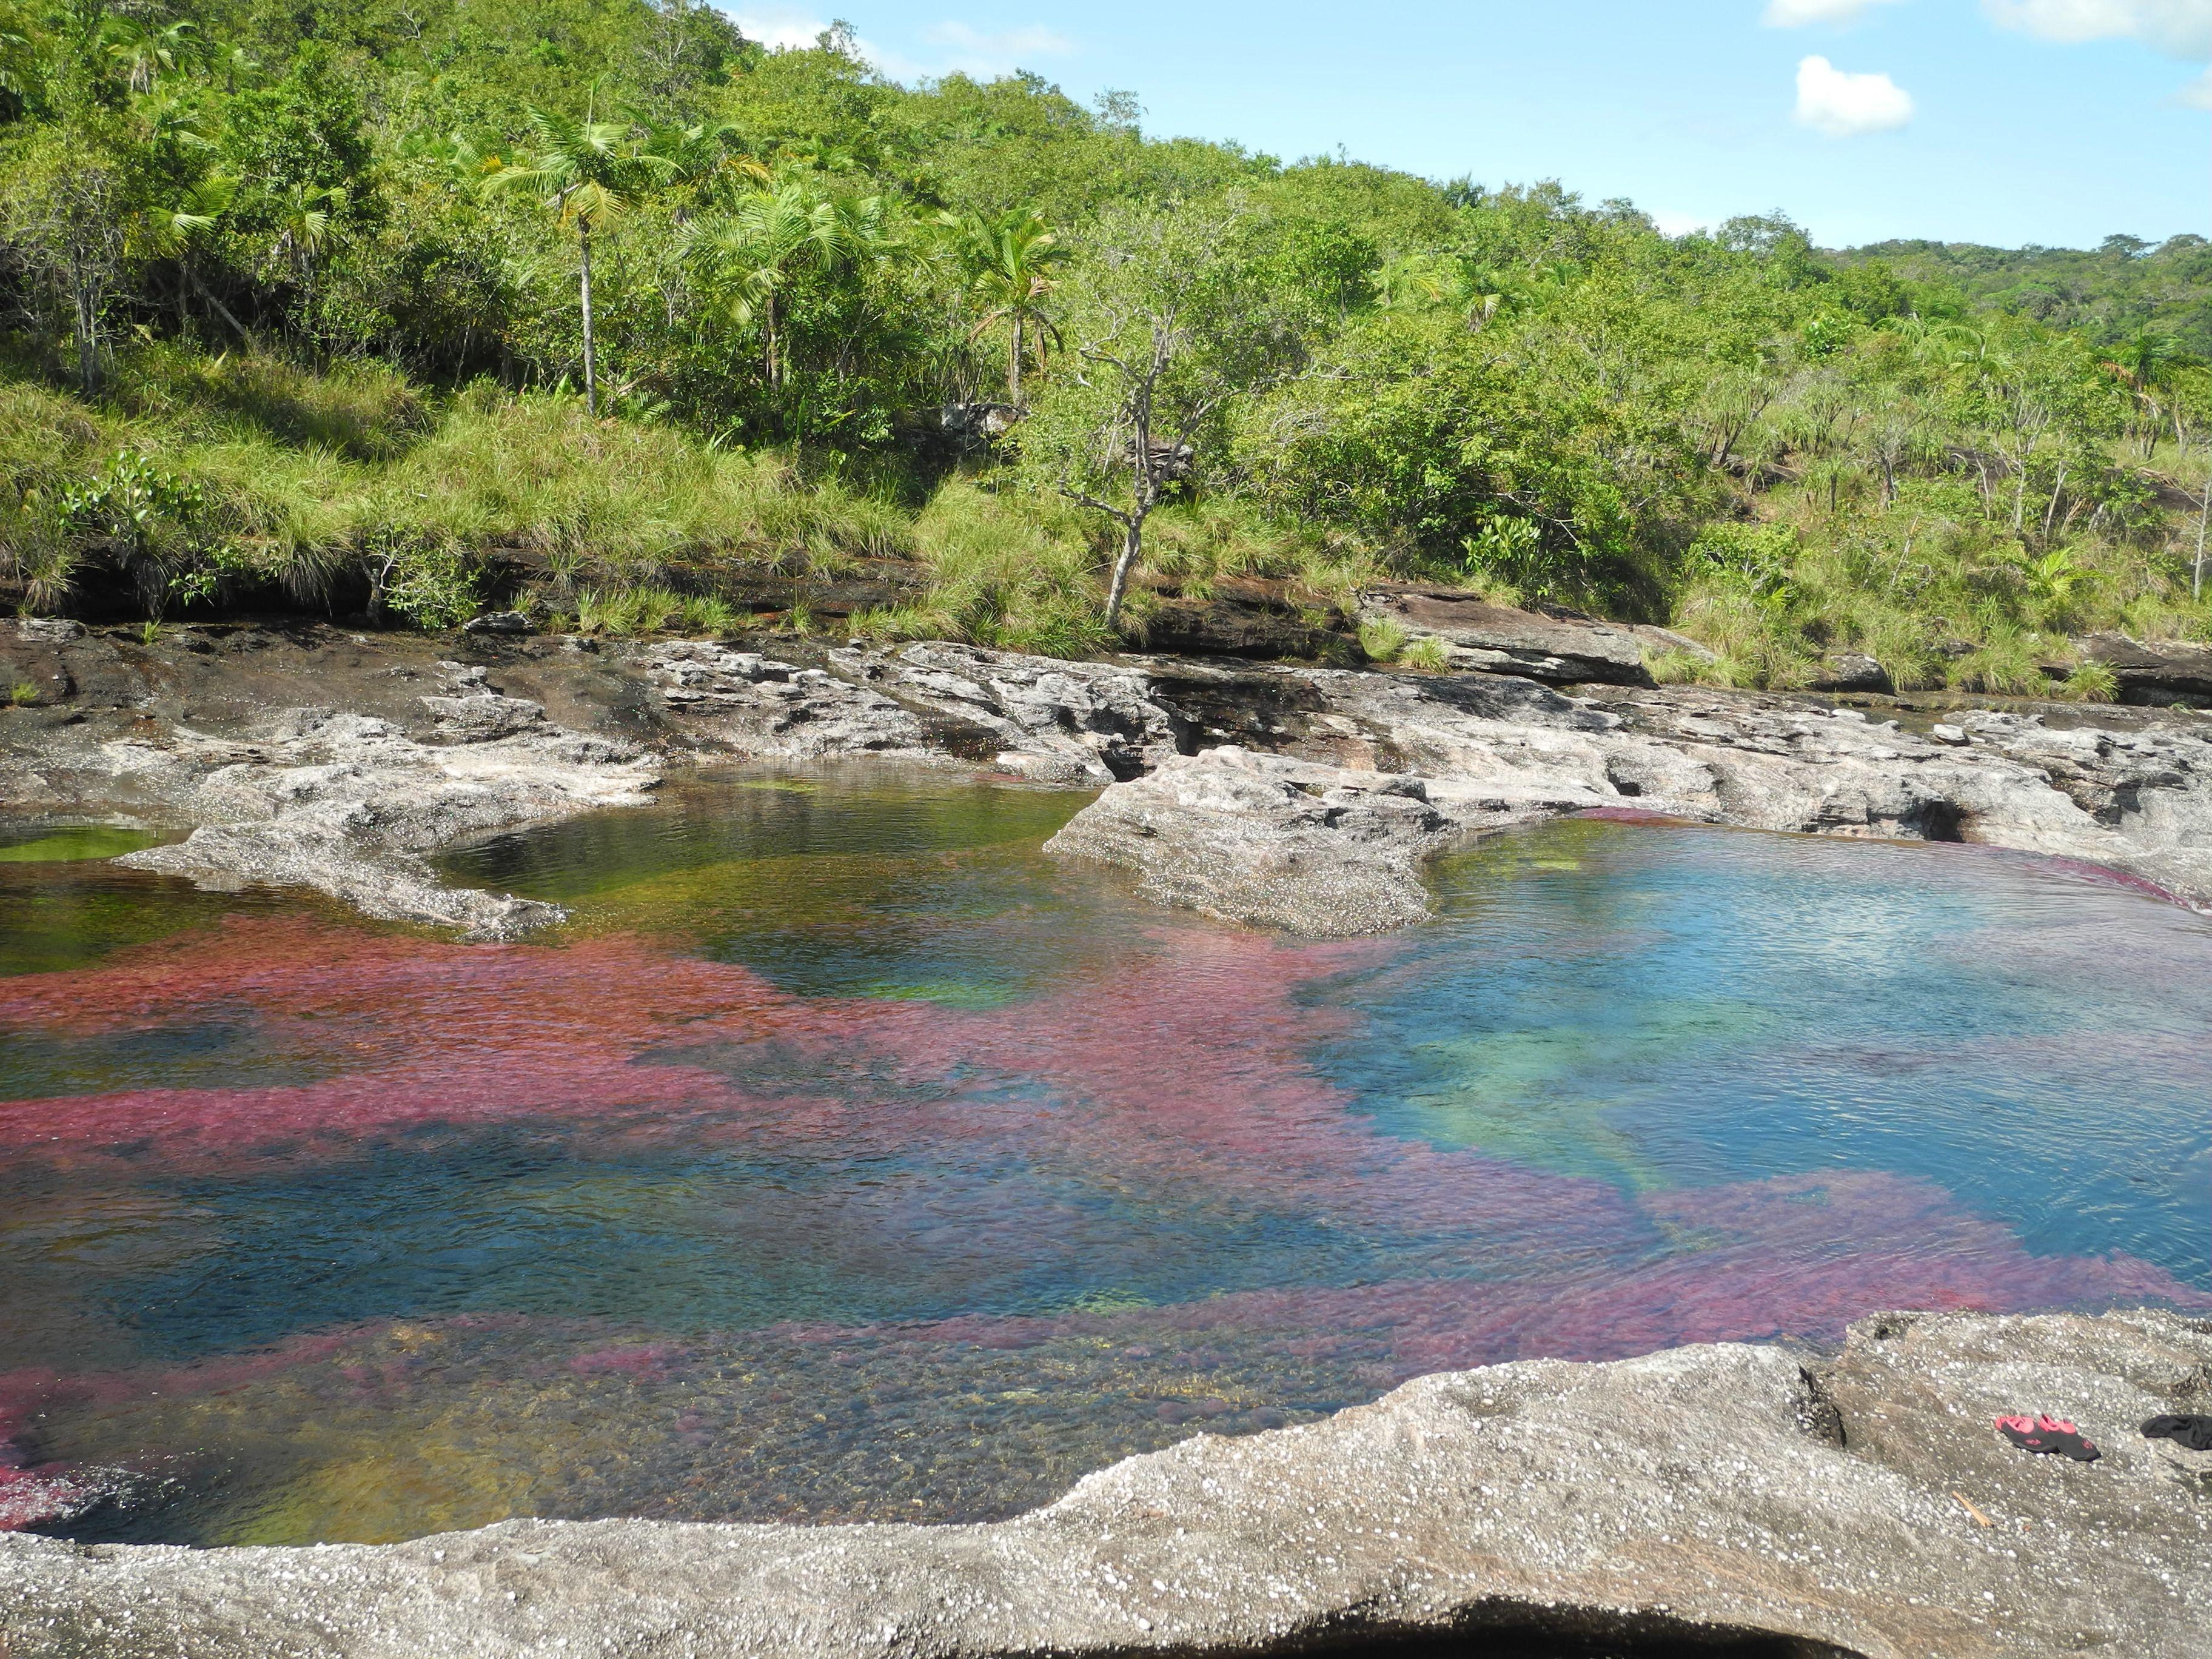 Caño Cristales, la rivière arc-en-ciel #nofilter